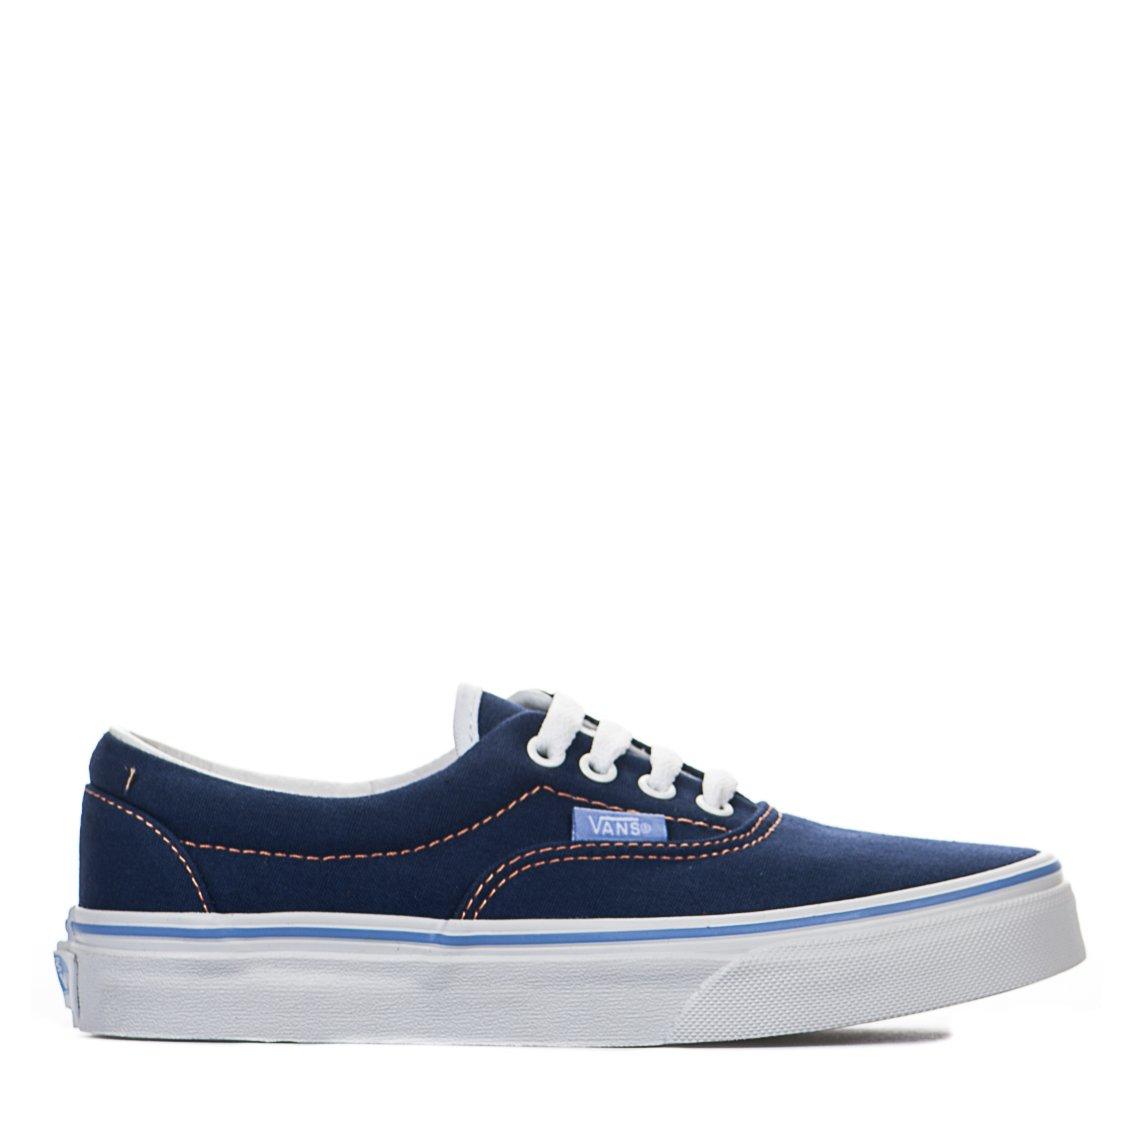 Baskets Vans bleu marine fille - ERA - 56593